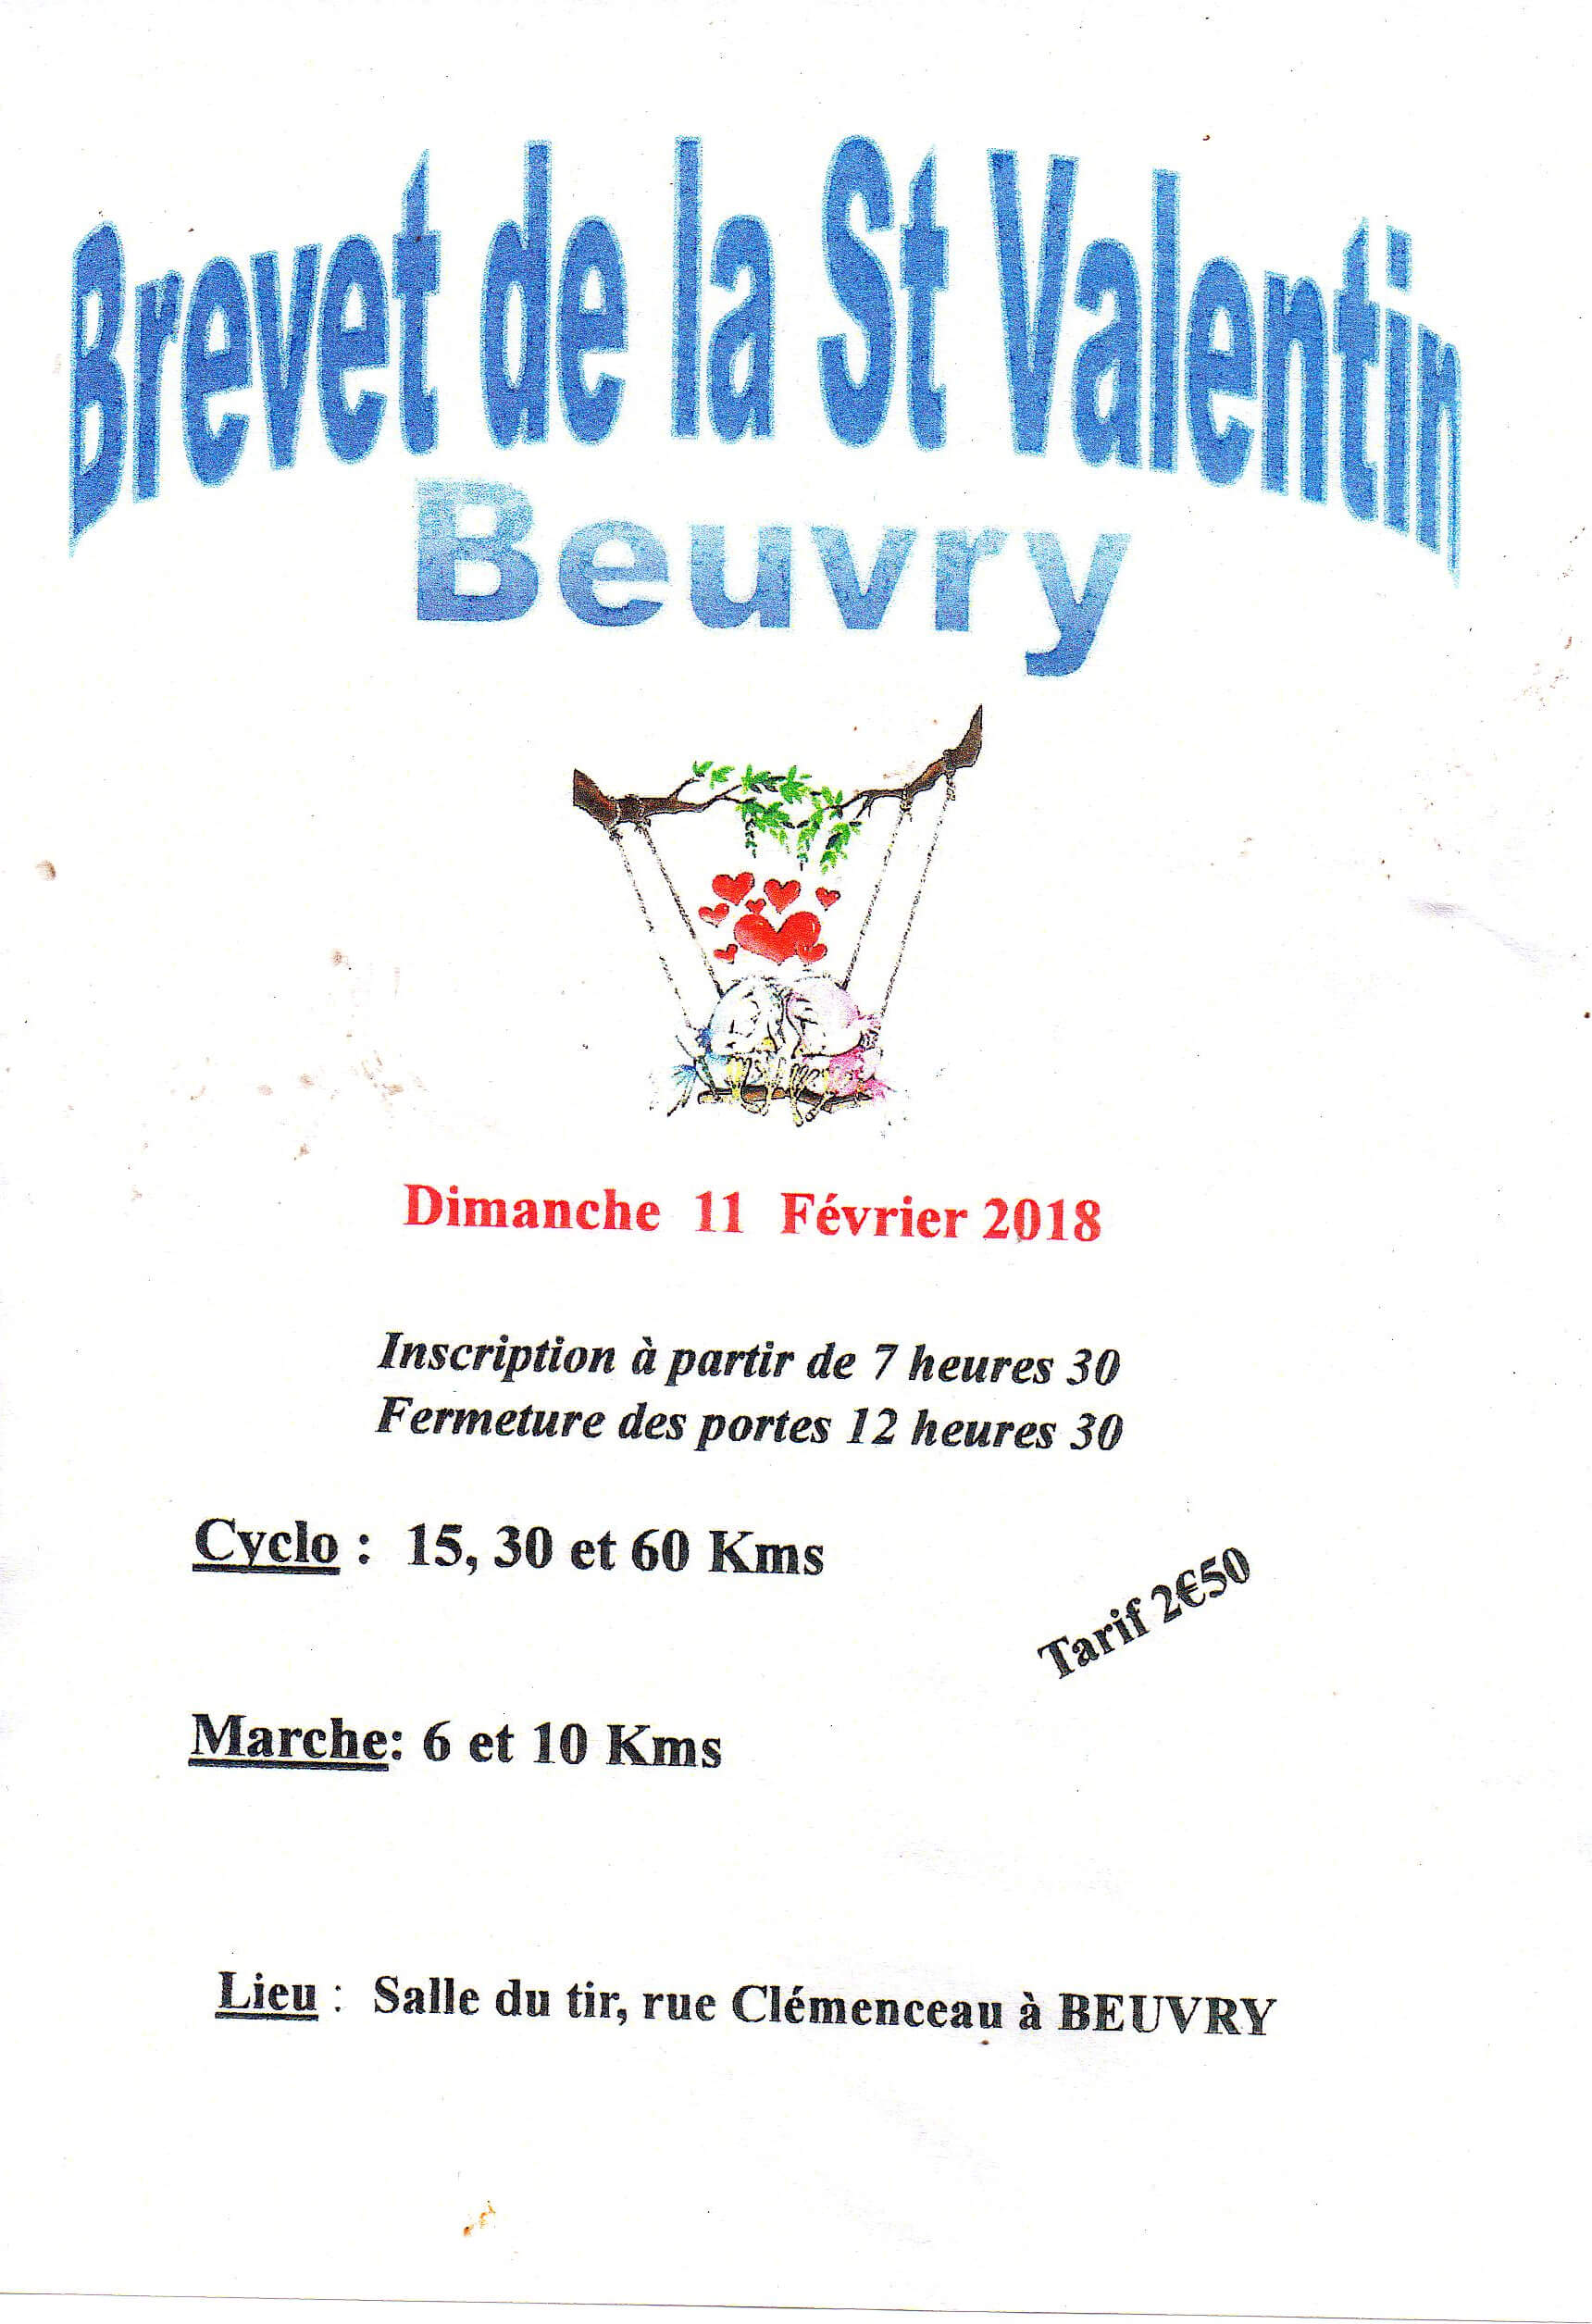 Brevet-de-la-St-Valentin-2018-Beuvry-62.jpg